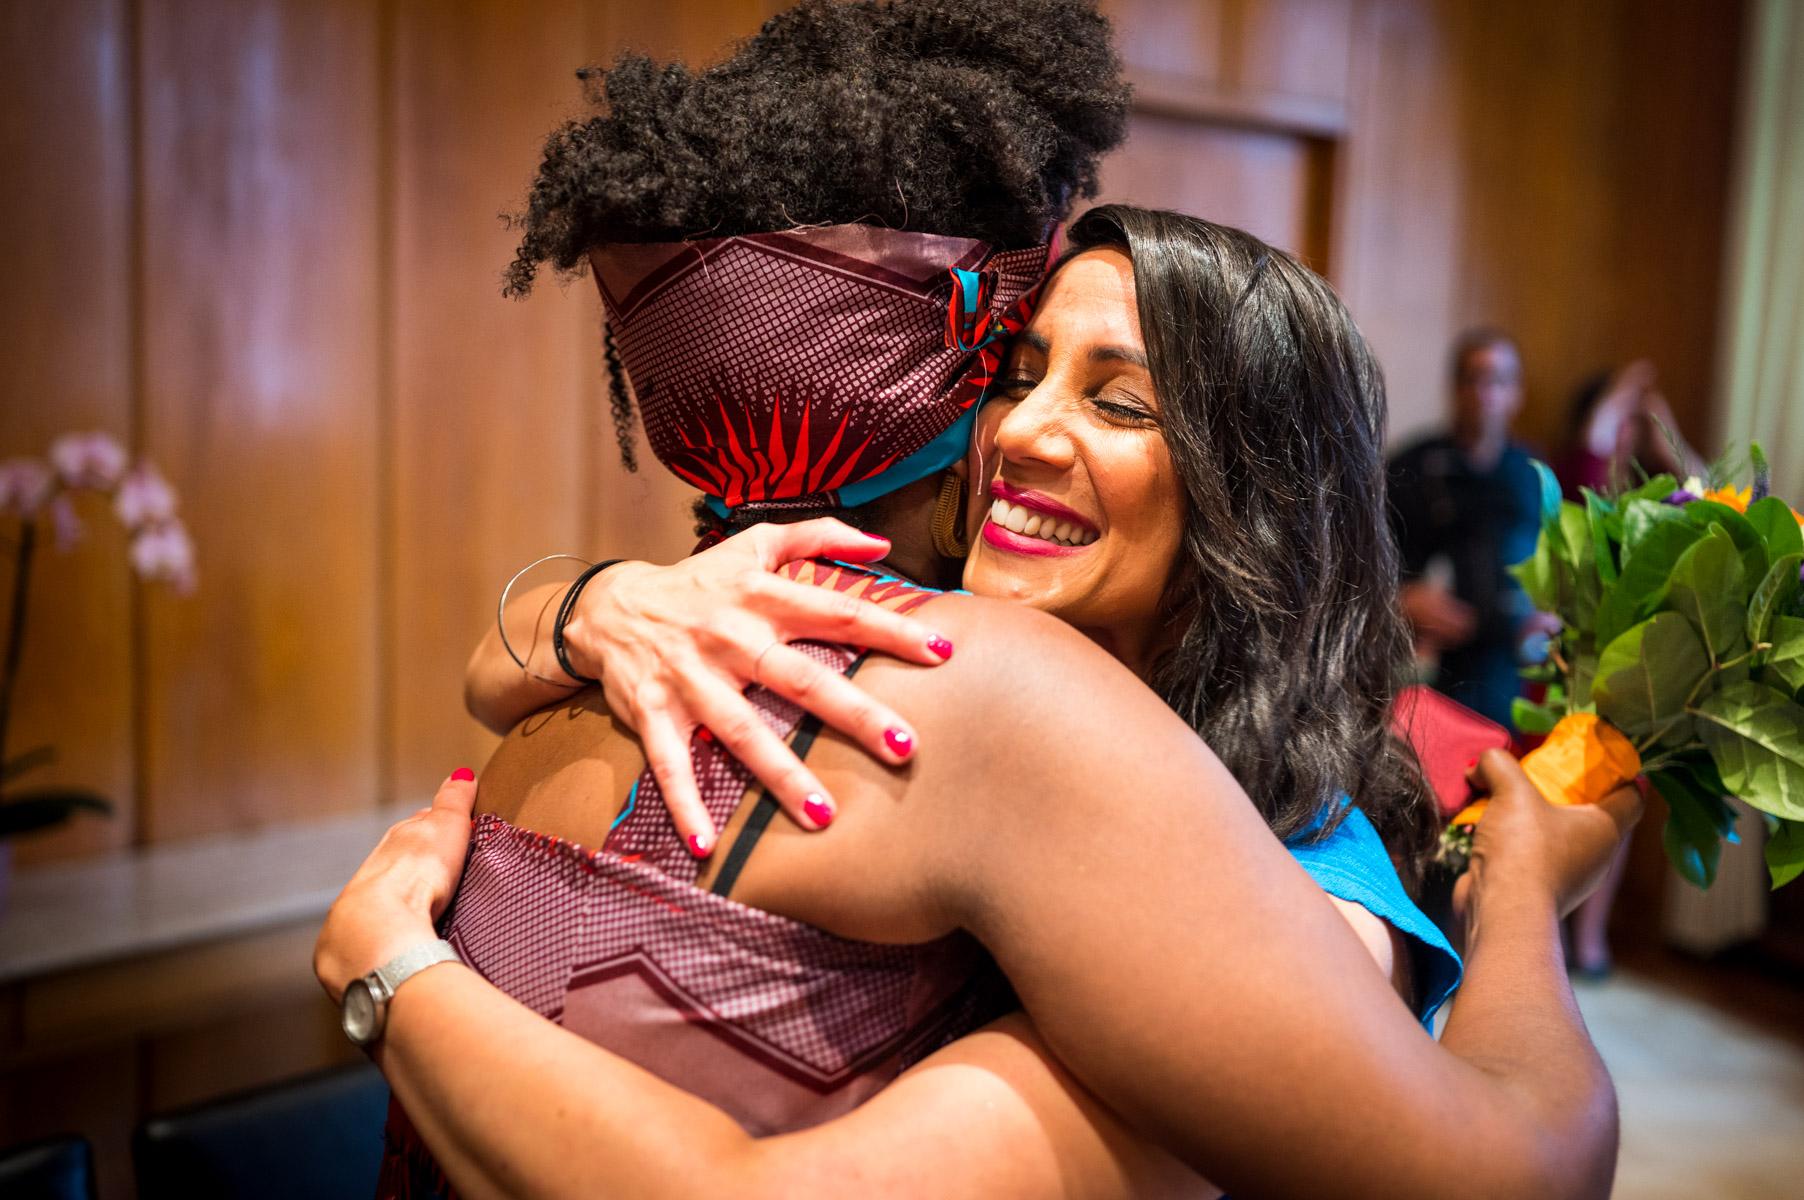 Romer Frankfurt City Hall Civil Elopement Photographer   After the ceremony, the bride hugs her friend